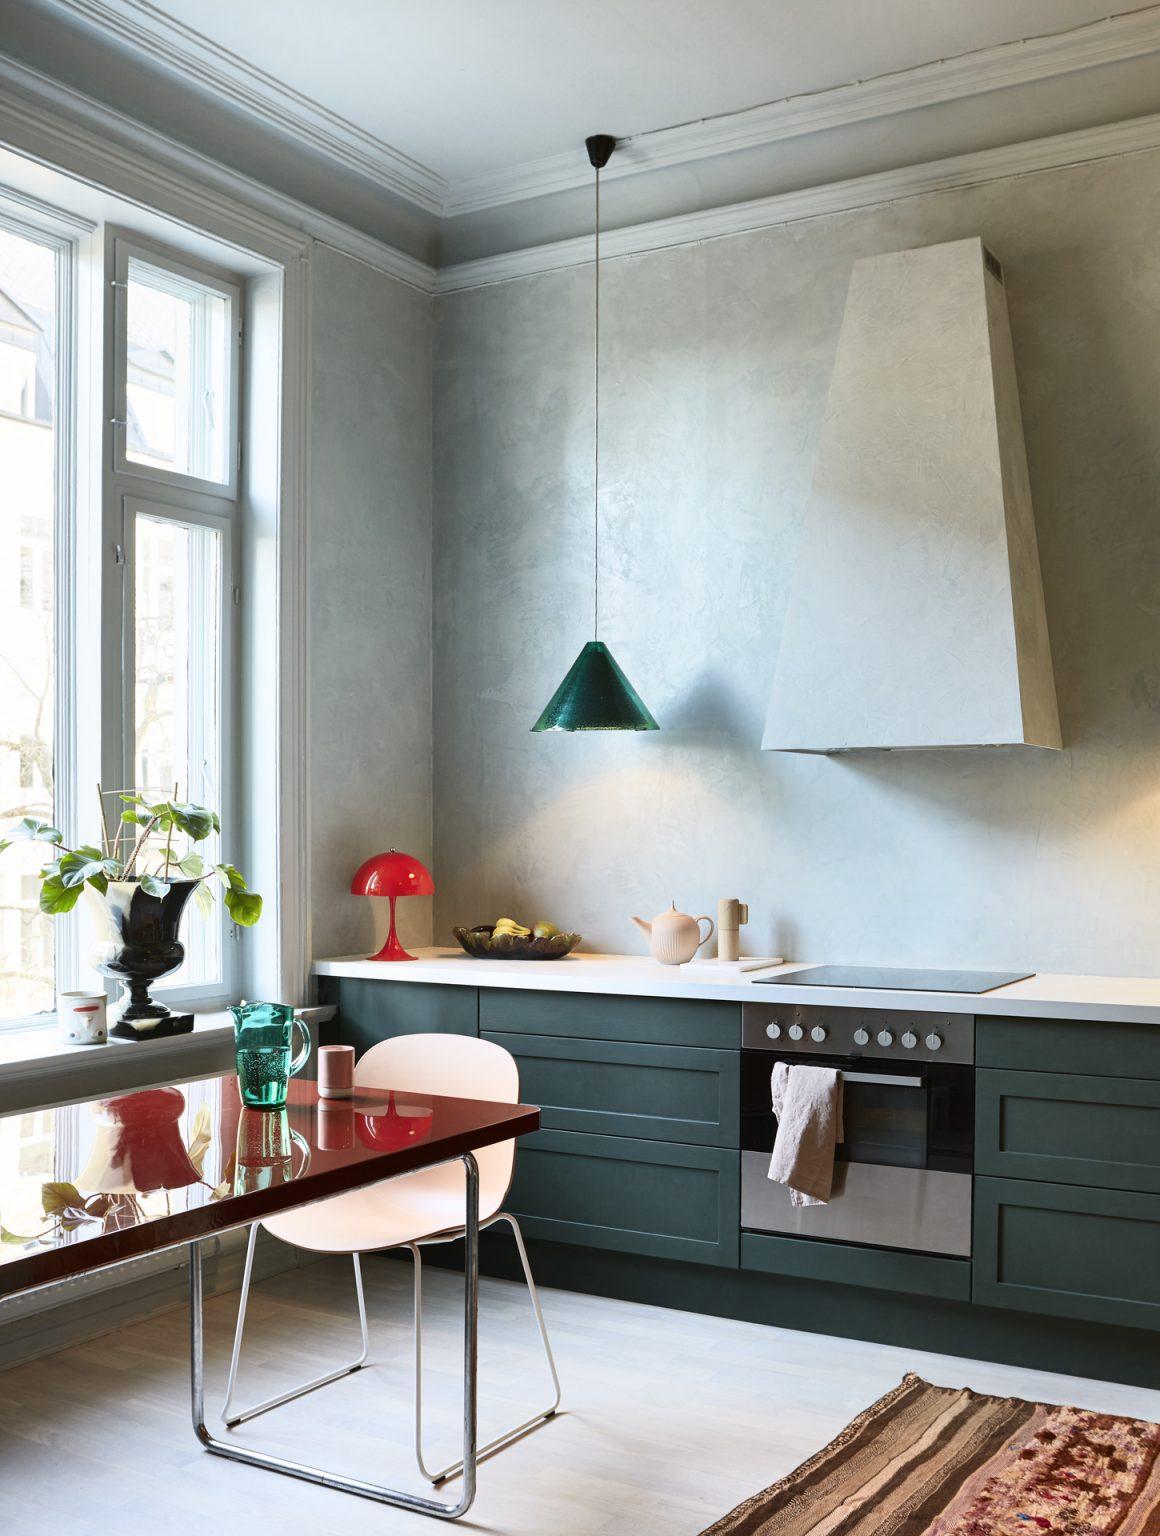 07_pure_original_polarblue_wall_blackhills_kitchencabinets